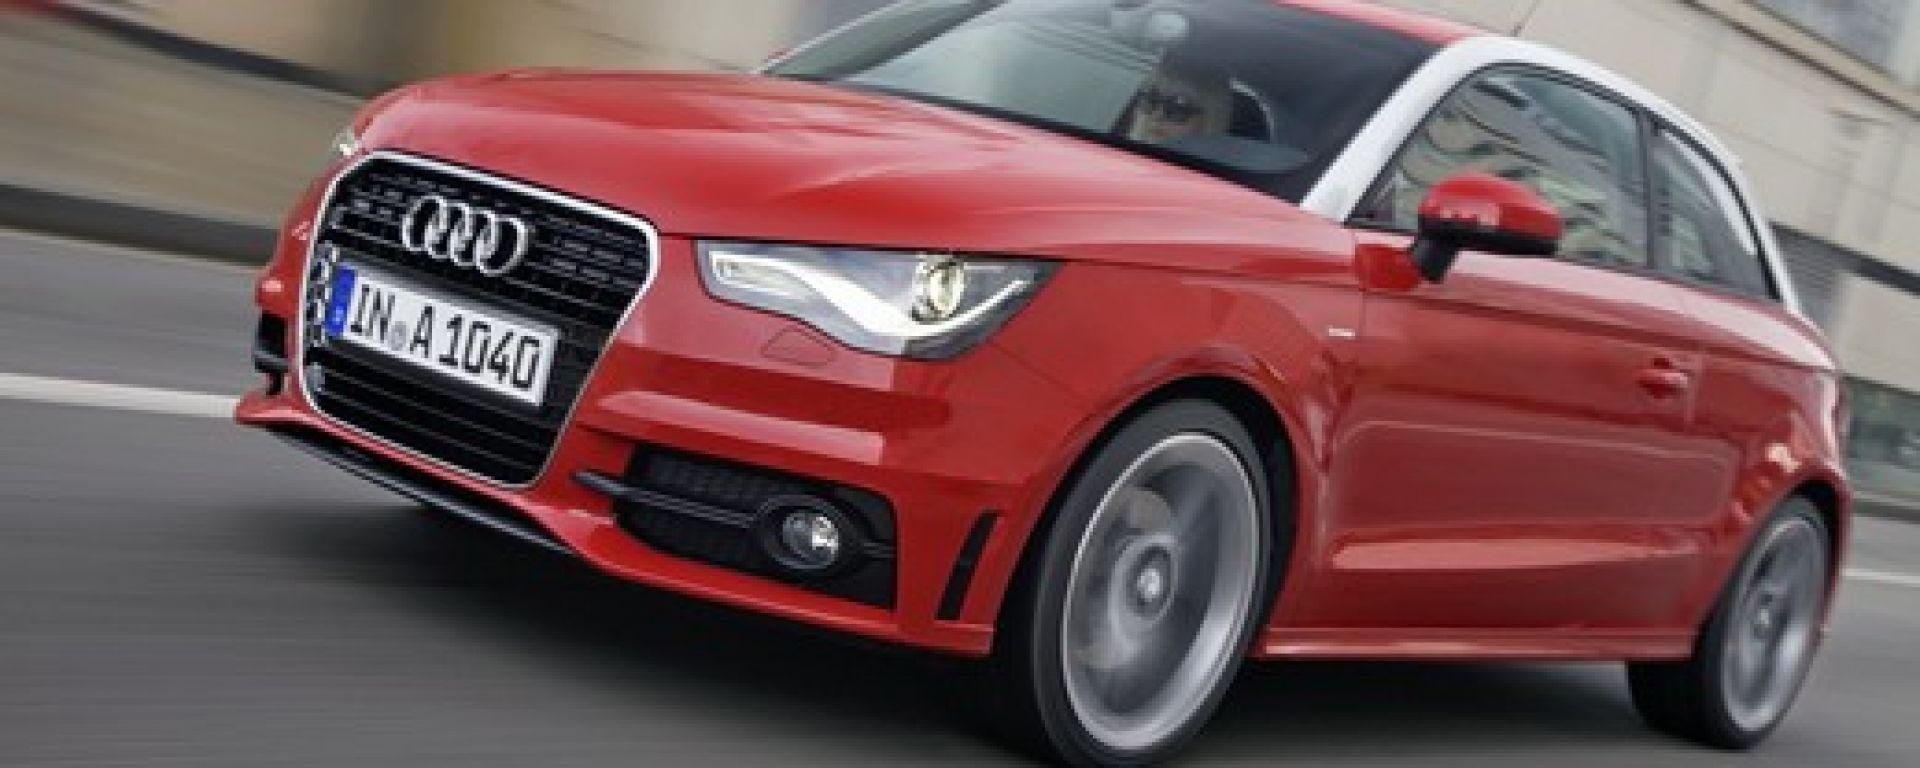 Audi A1 2.0 TDI CR